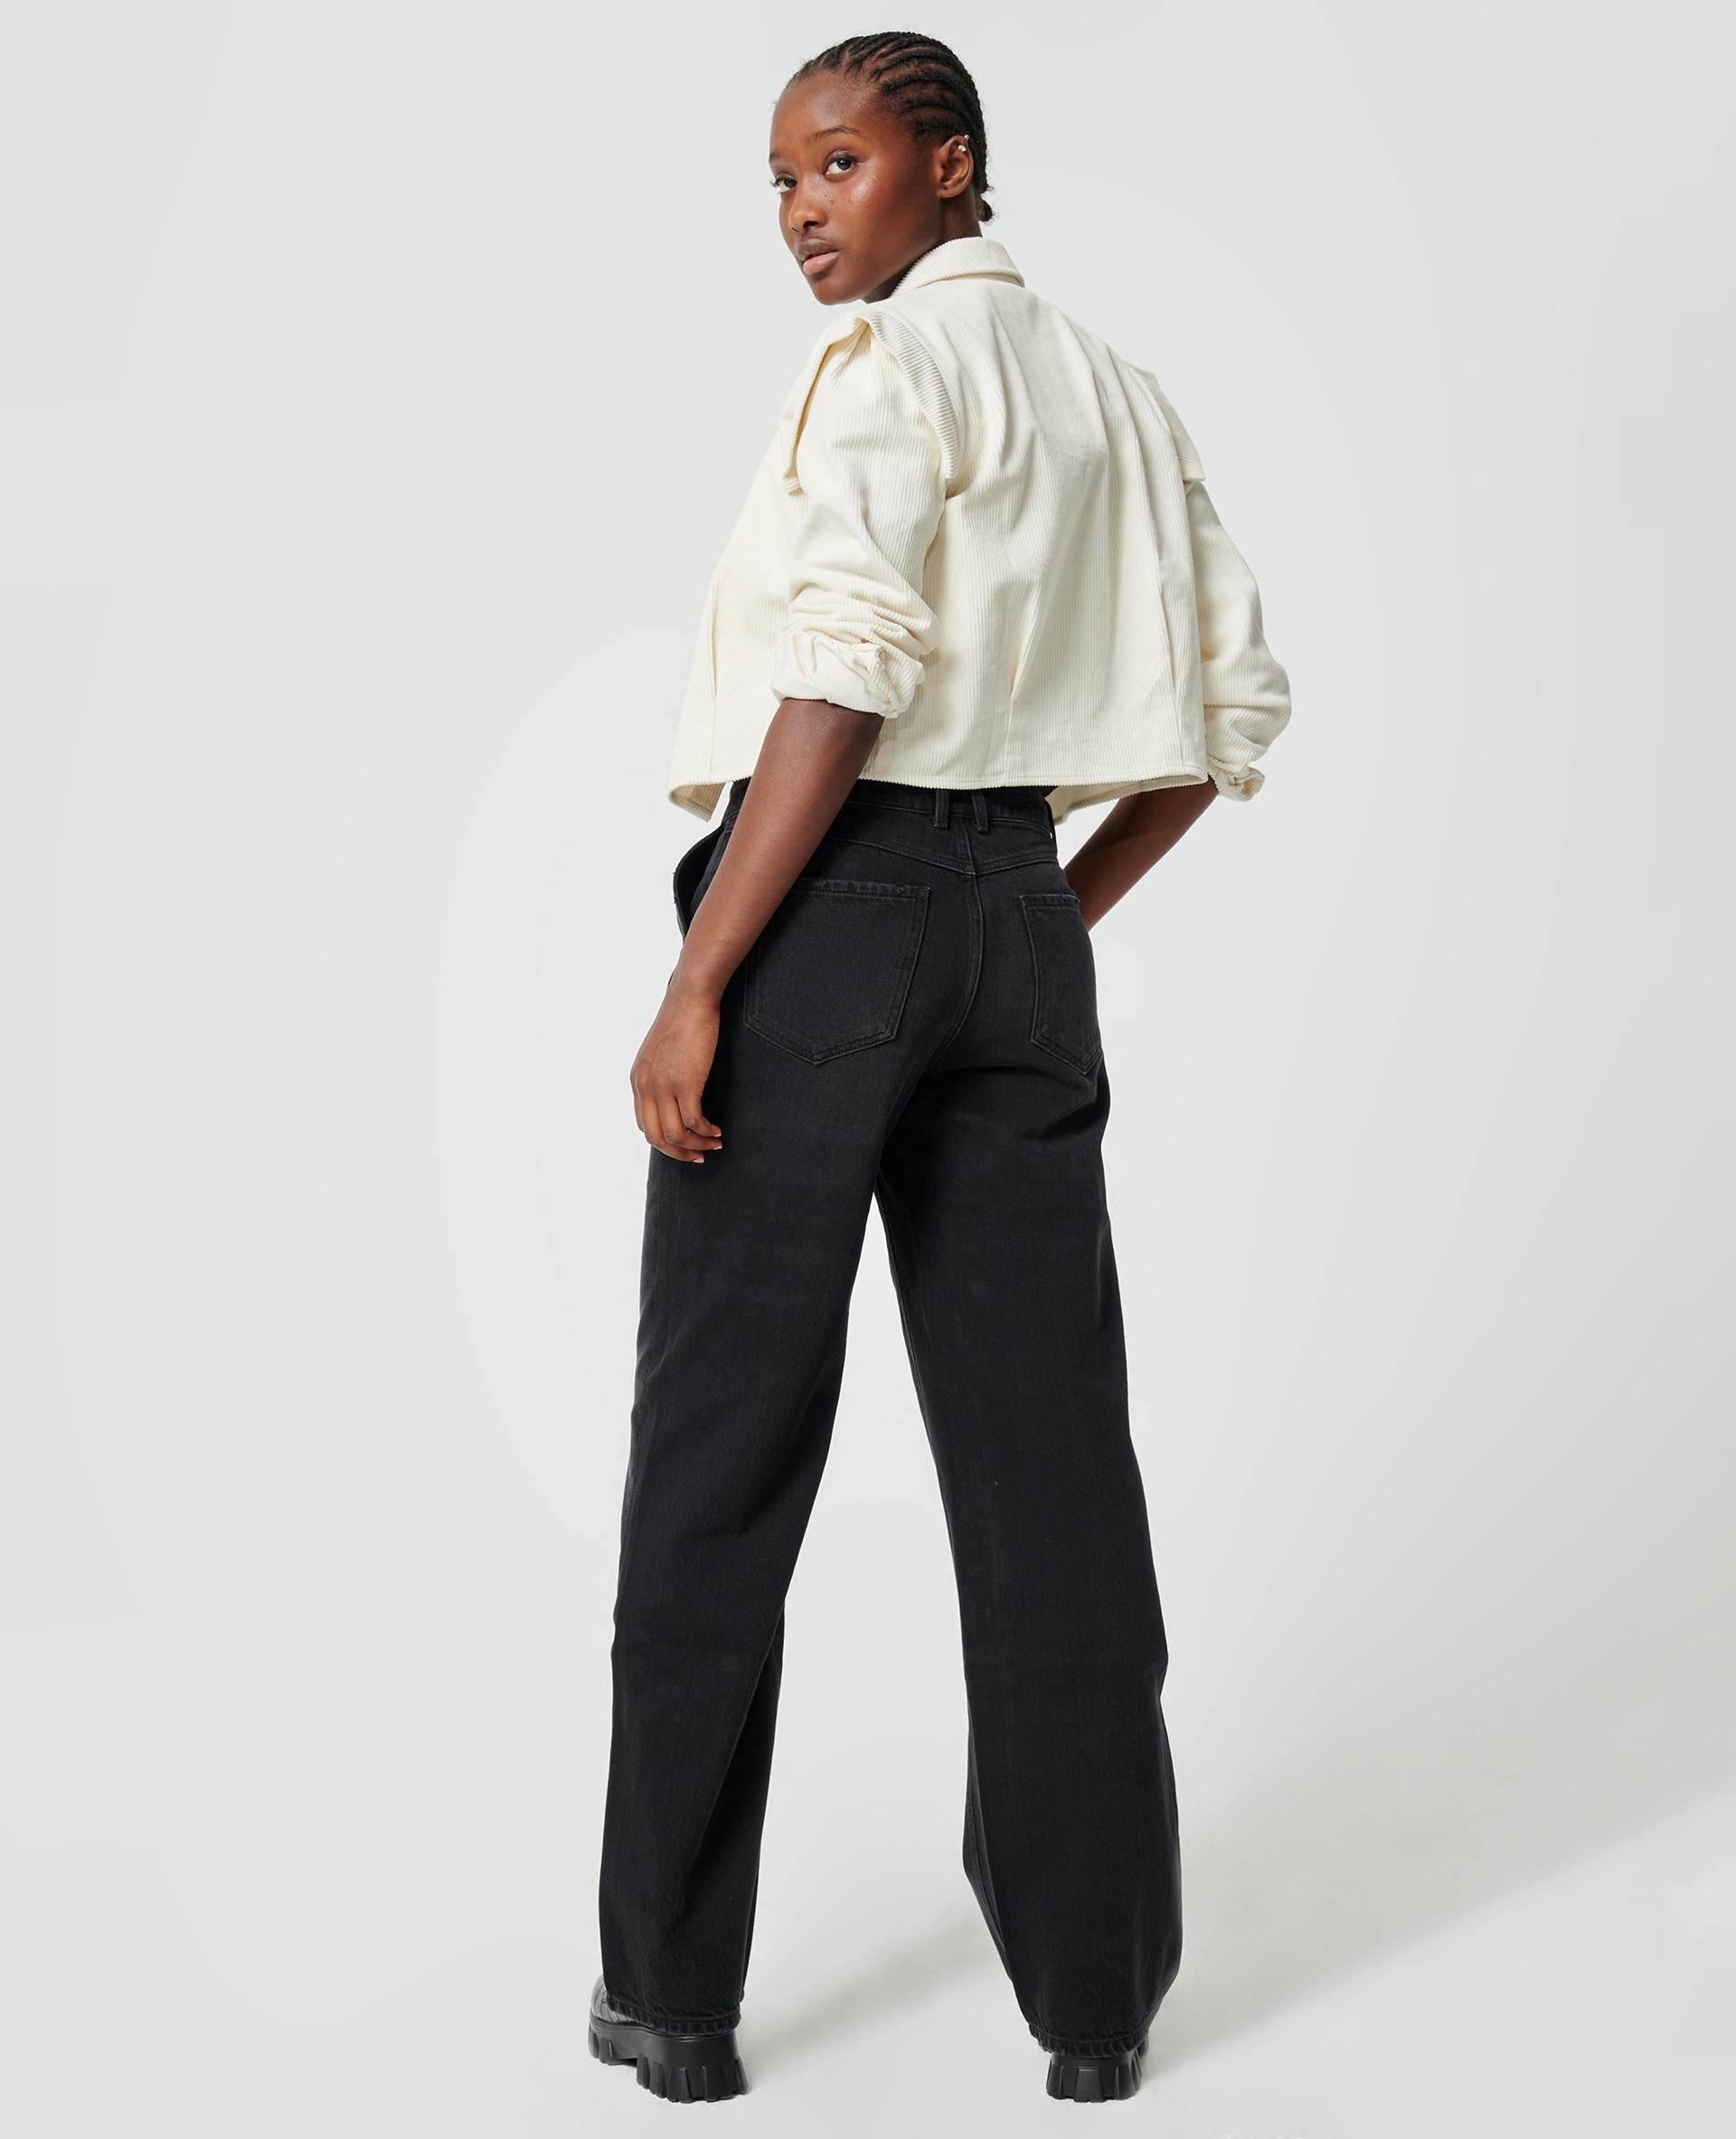 Jean baggy taille basse noir - Pimkie